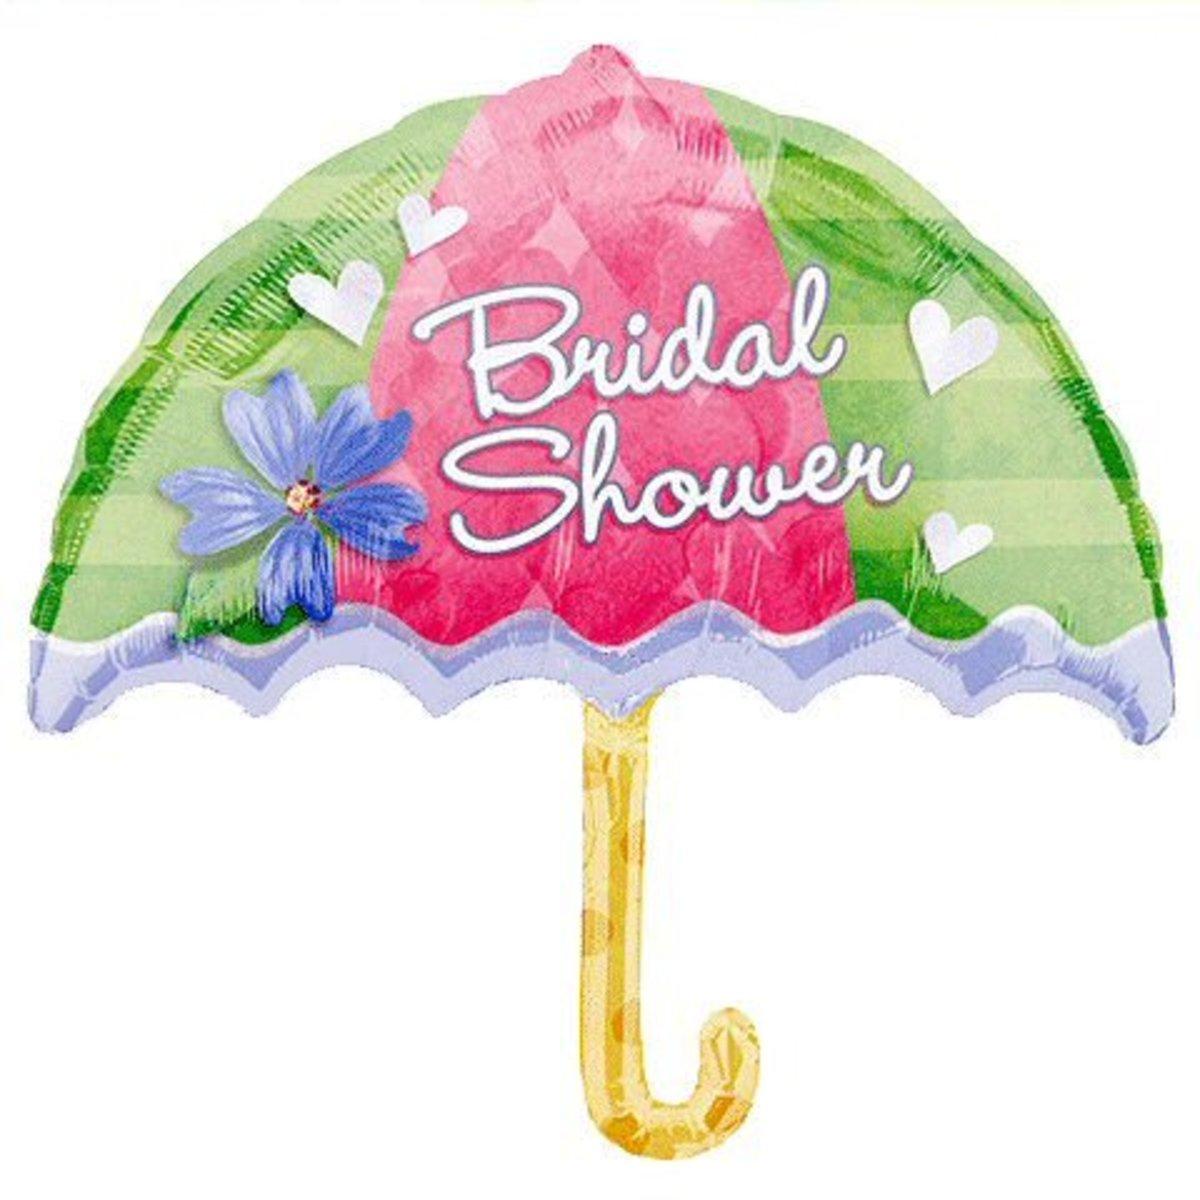 10 Fun Bridal Shower Game Ideas hubpages